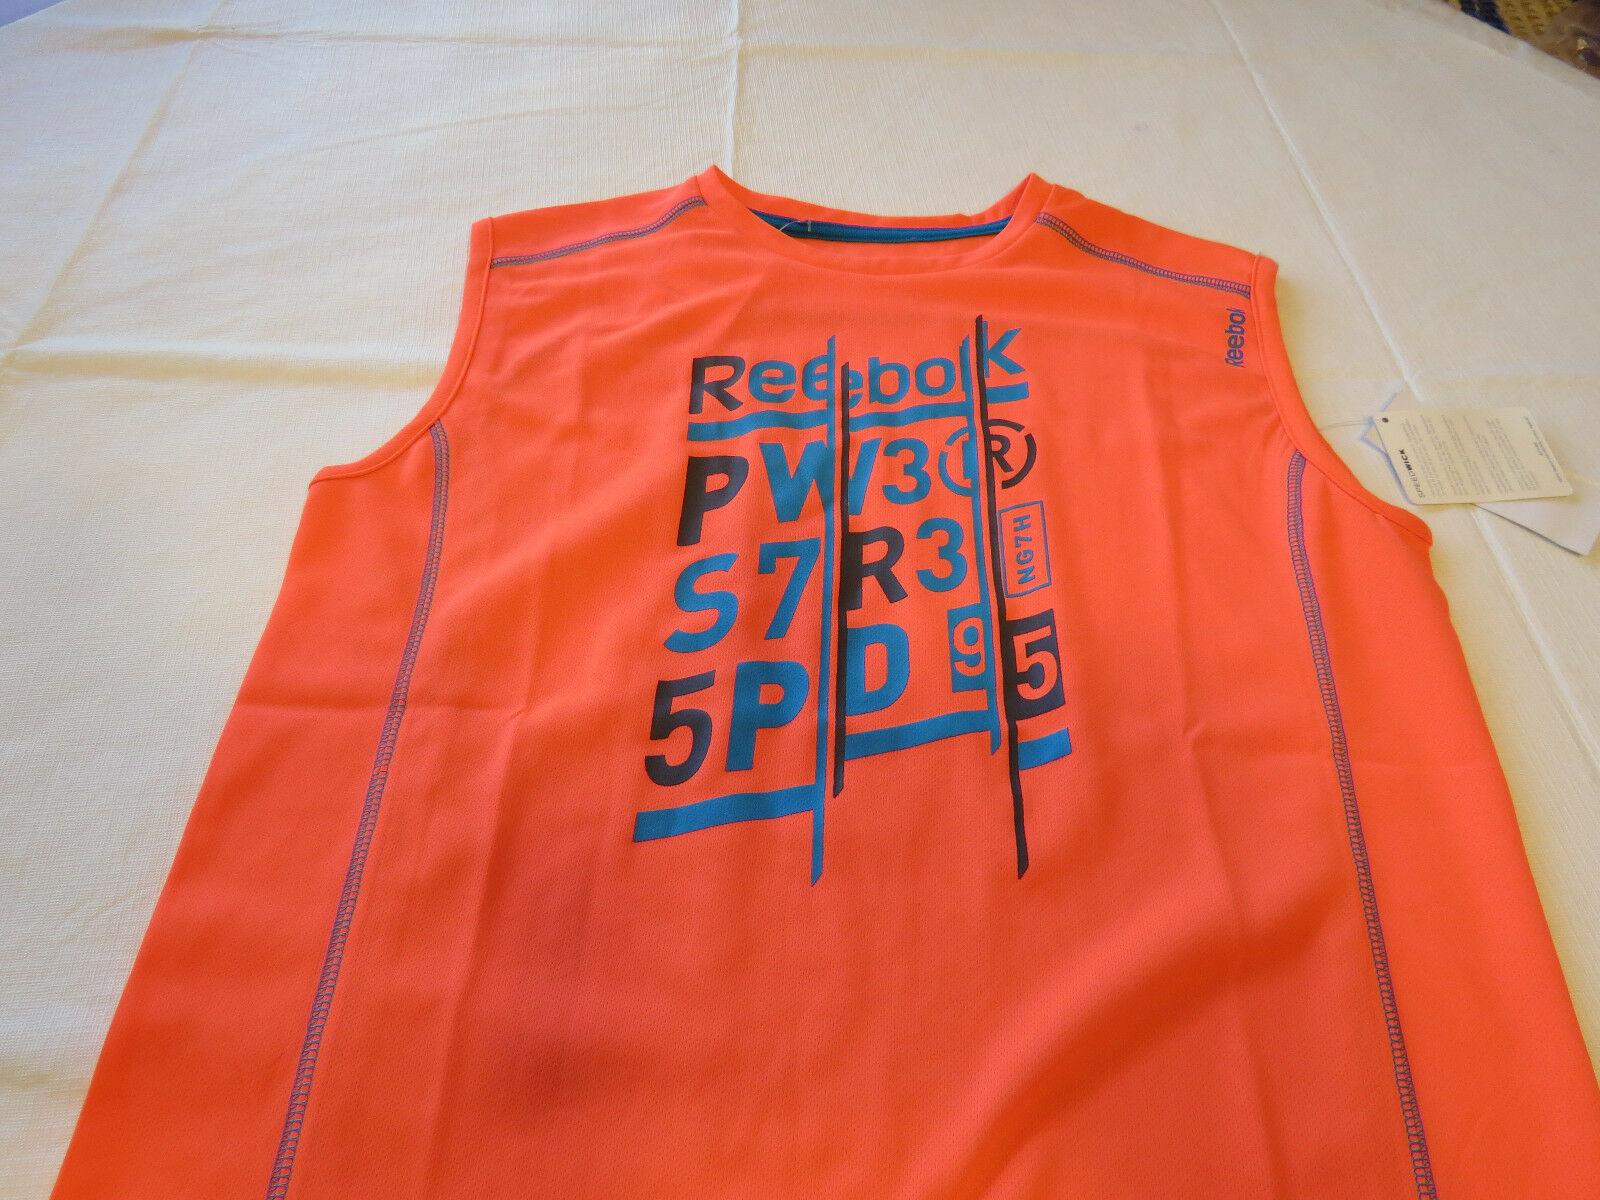 Boys youth Reebok surf skate L muscle tank top shirt 820 neon orange vqxm61538 image 2